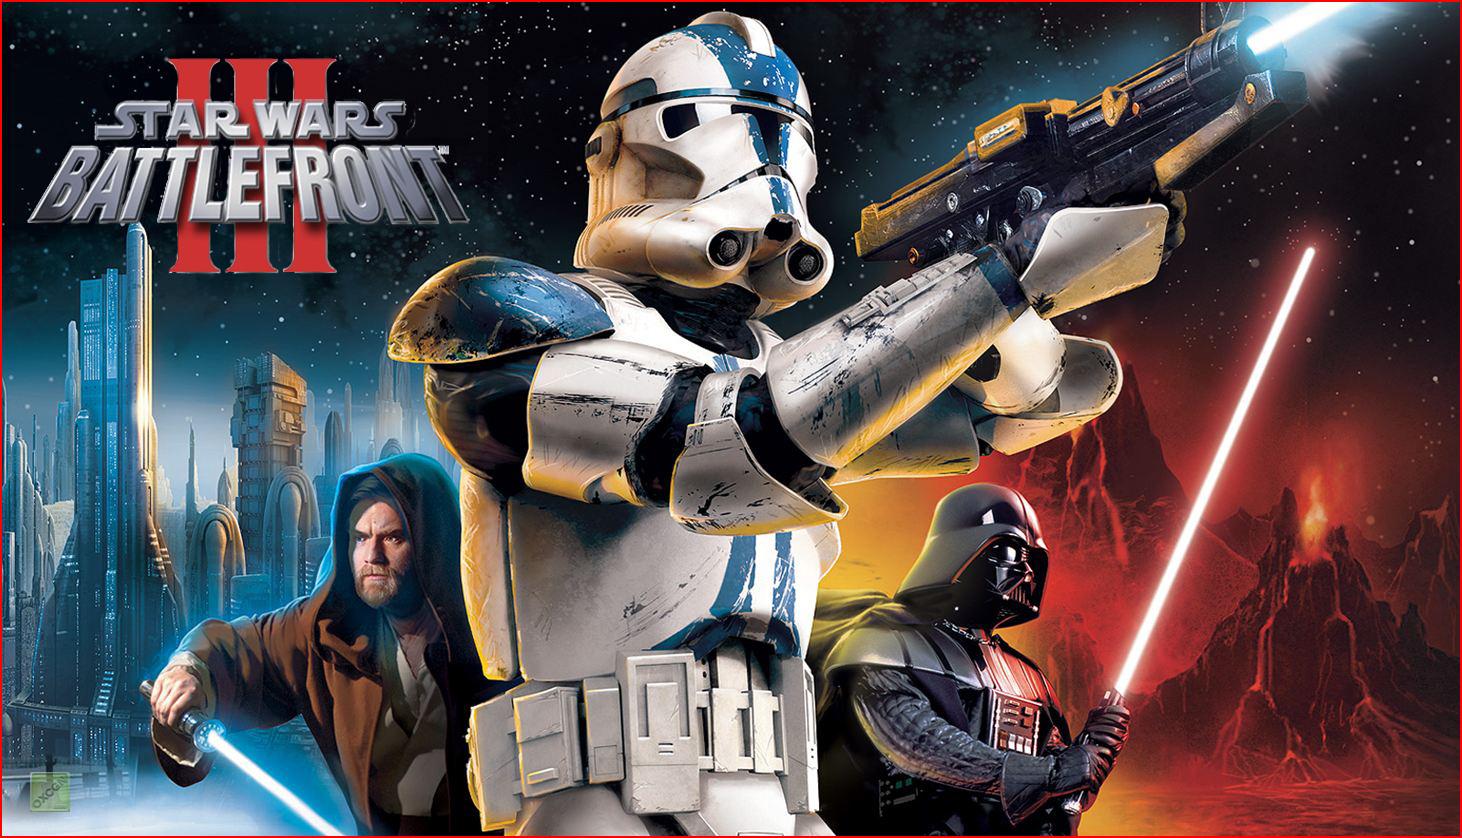 Twitch.TV member streams 'Star Wars: Battlefront III'